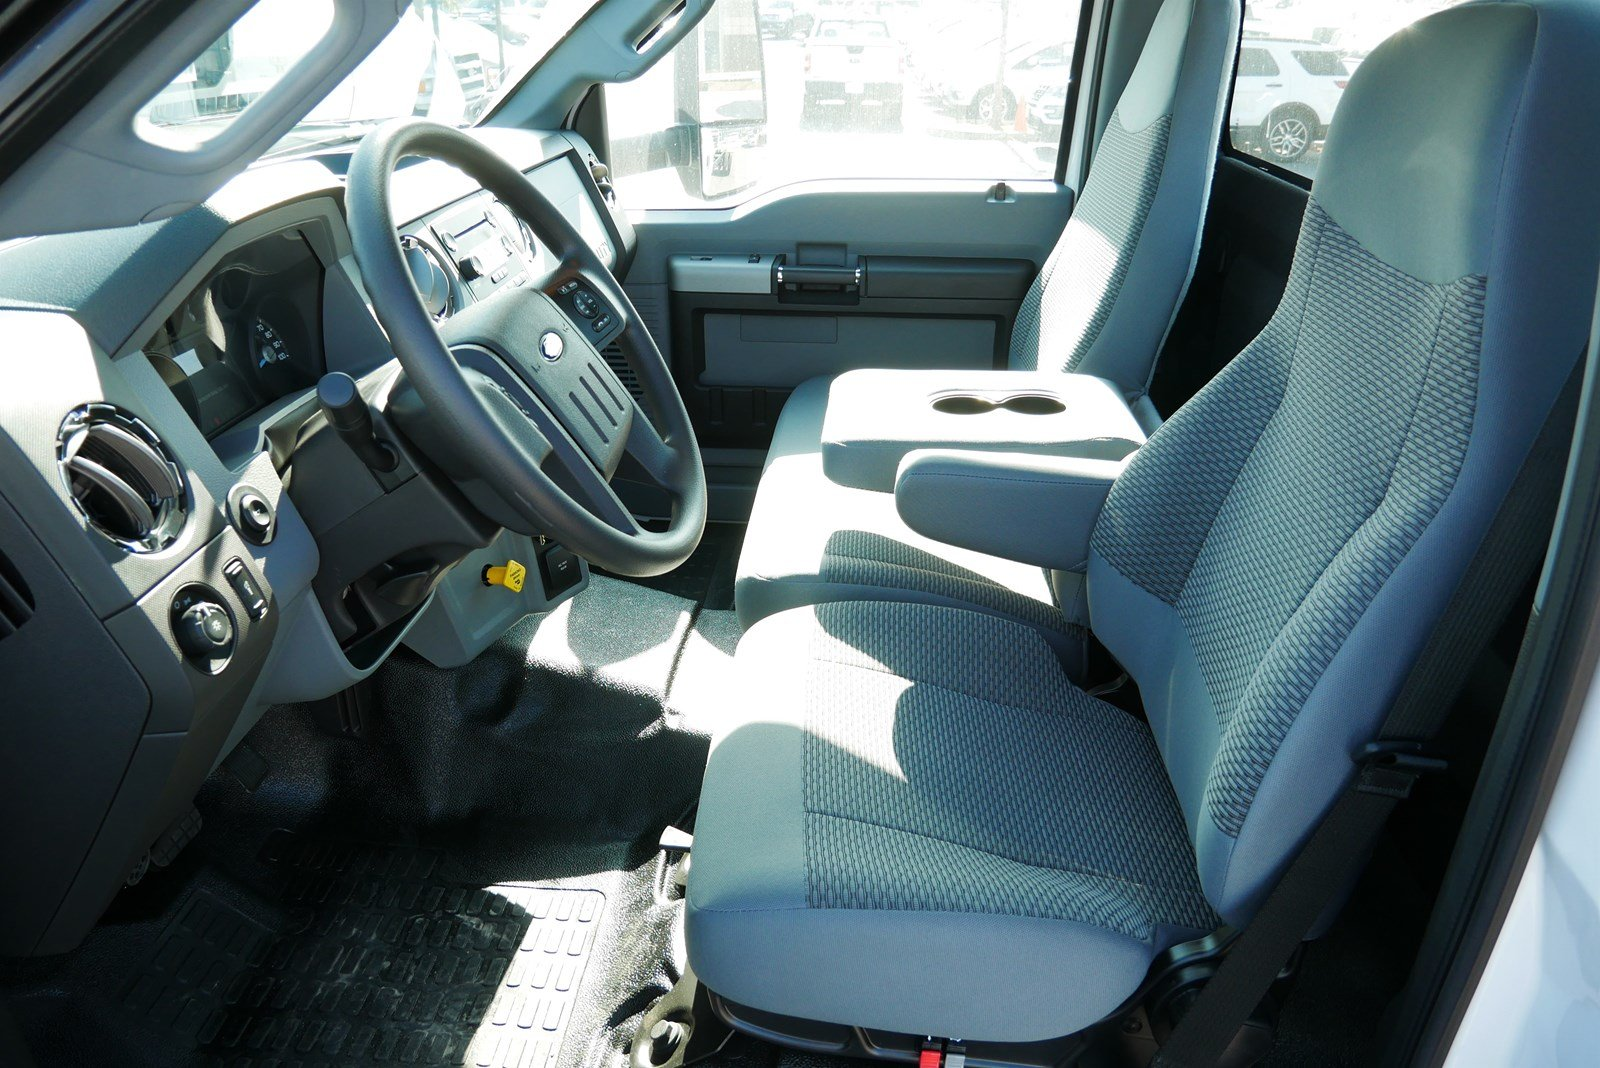 2019 F-750 Regular Cab DRW 4x2, Cab Chassis #69293 - photo 13